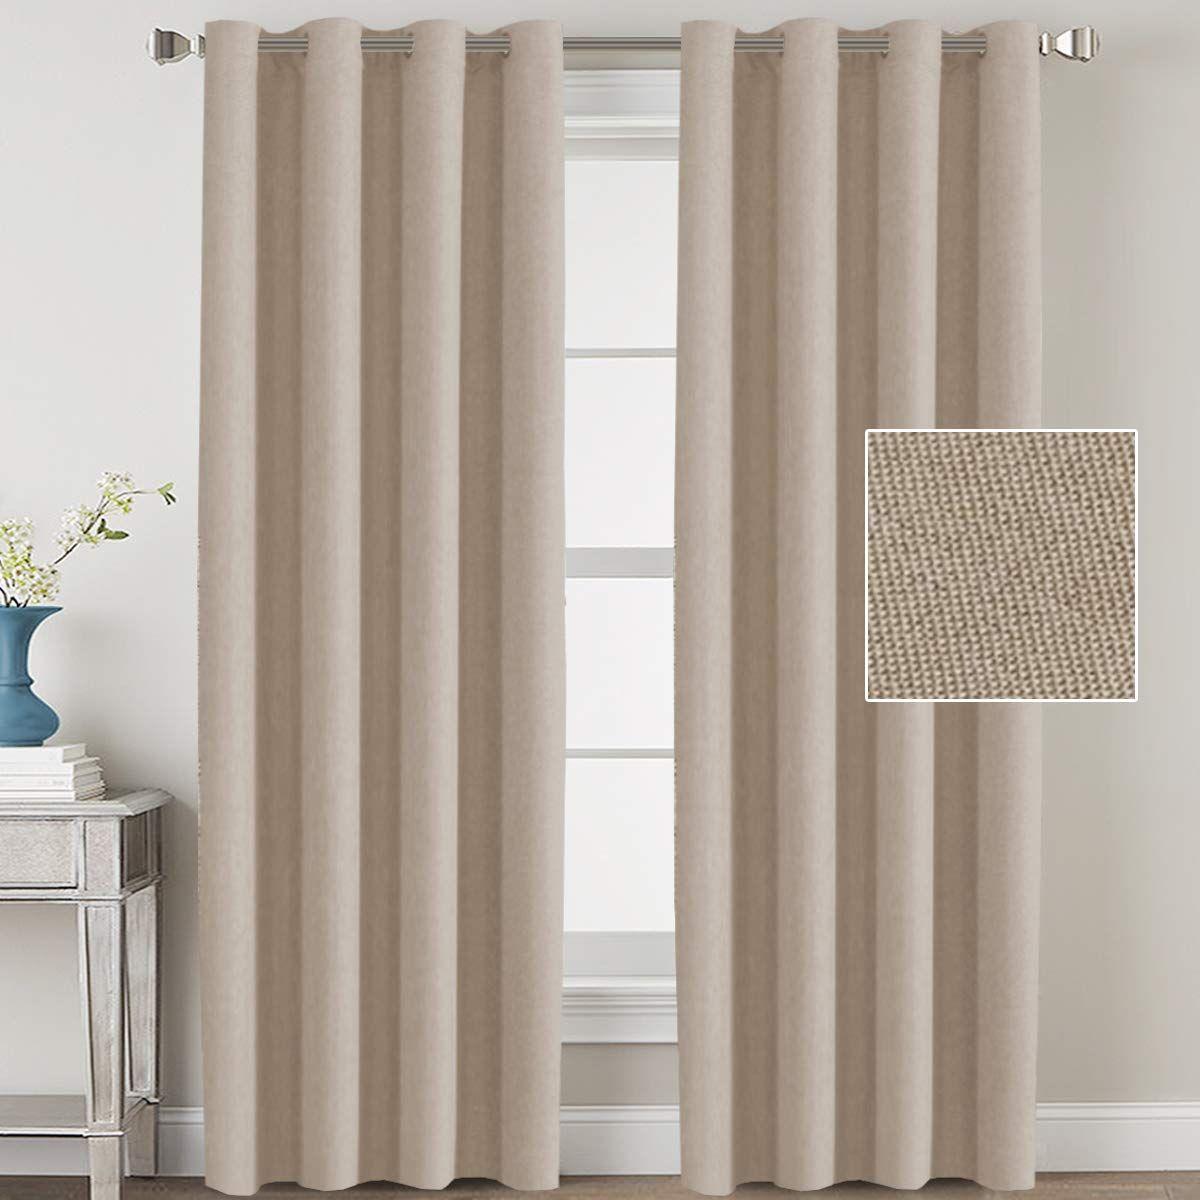 H Versailtex Linen Blackout Curtains 84 Inches Long Room Darkening Heavy Duty Burlap Efffect Textured L Linen Blackout Curtains Curtains Curtains And Draperies